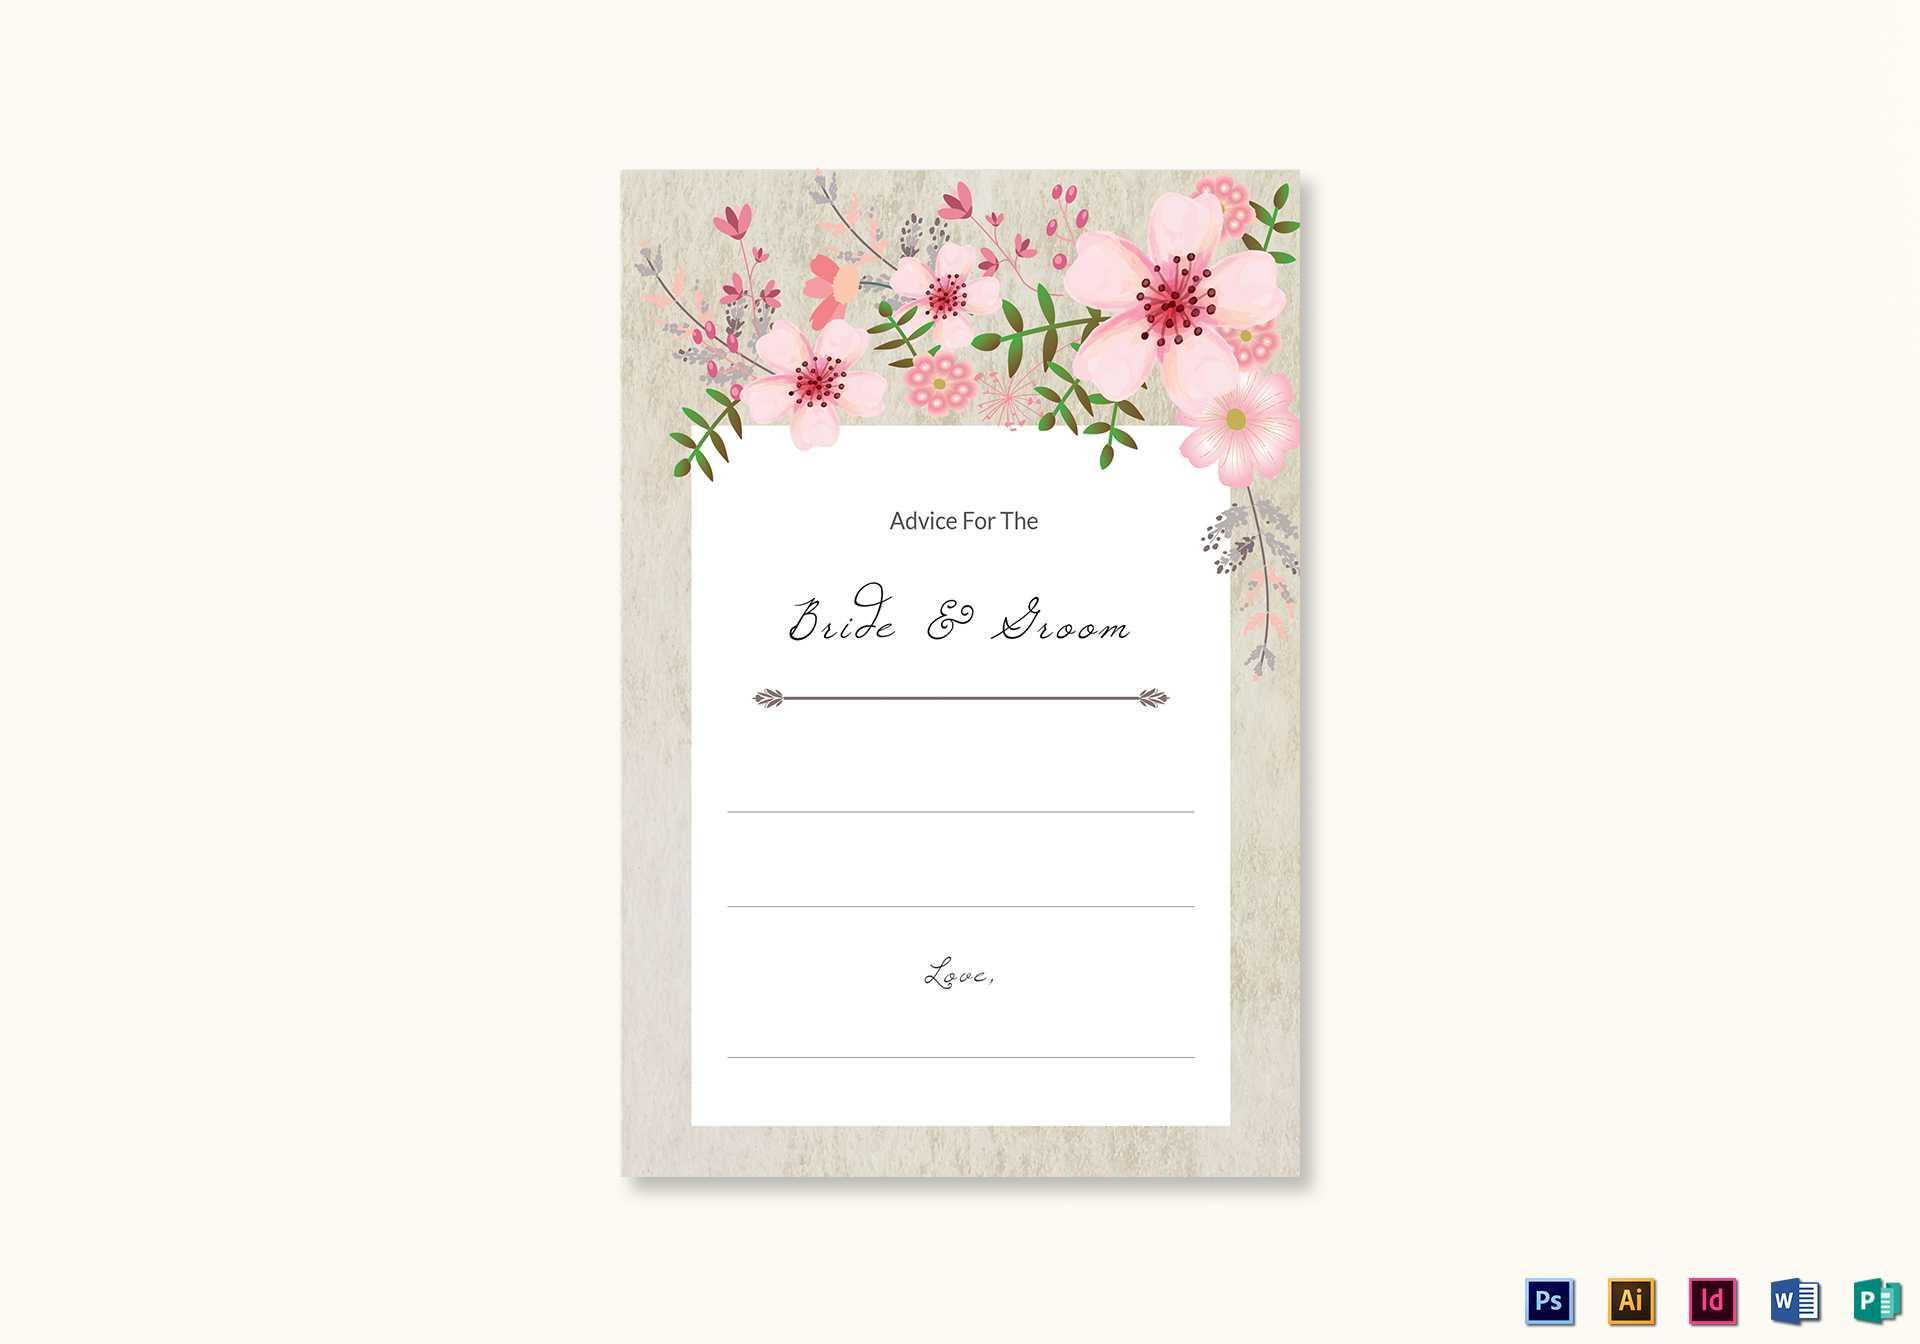 Pink Floral Wedding Advice Card Template Regarding Marriage Advice Cards Templates